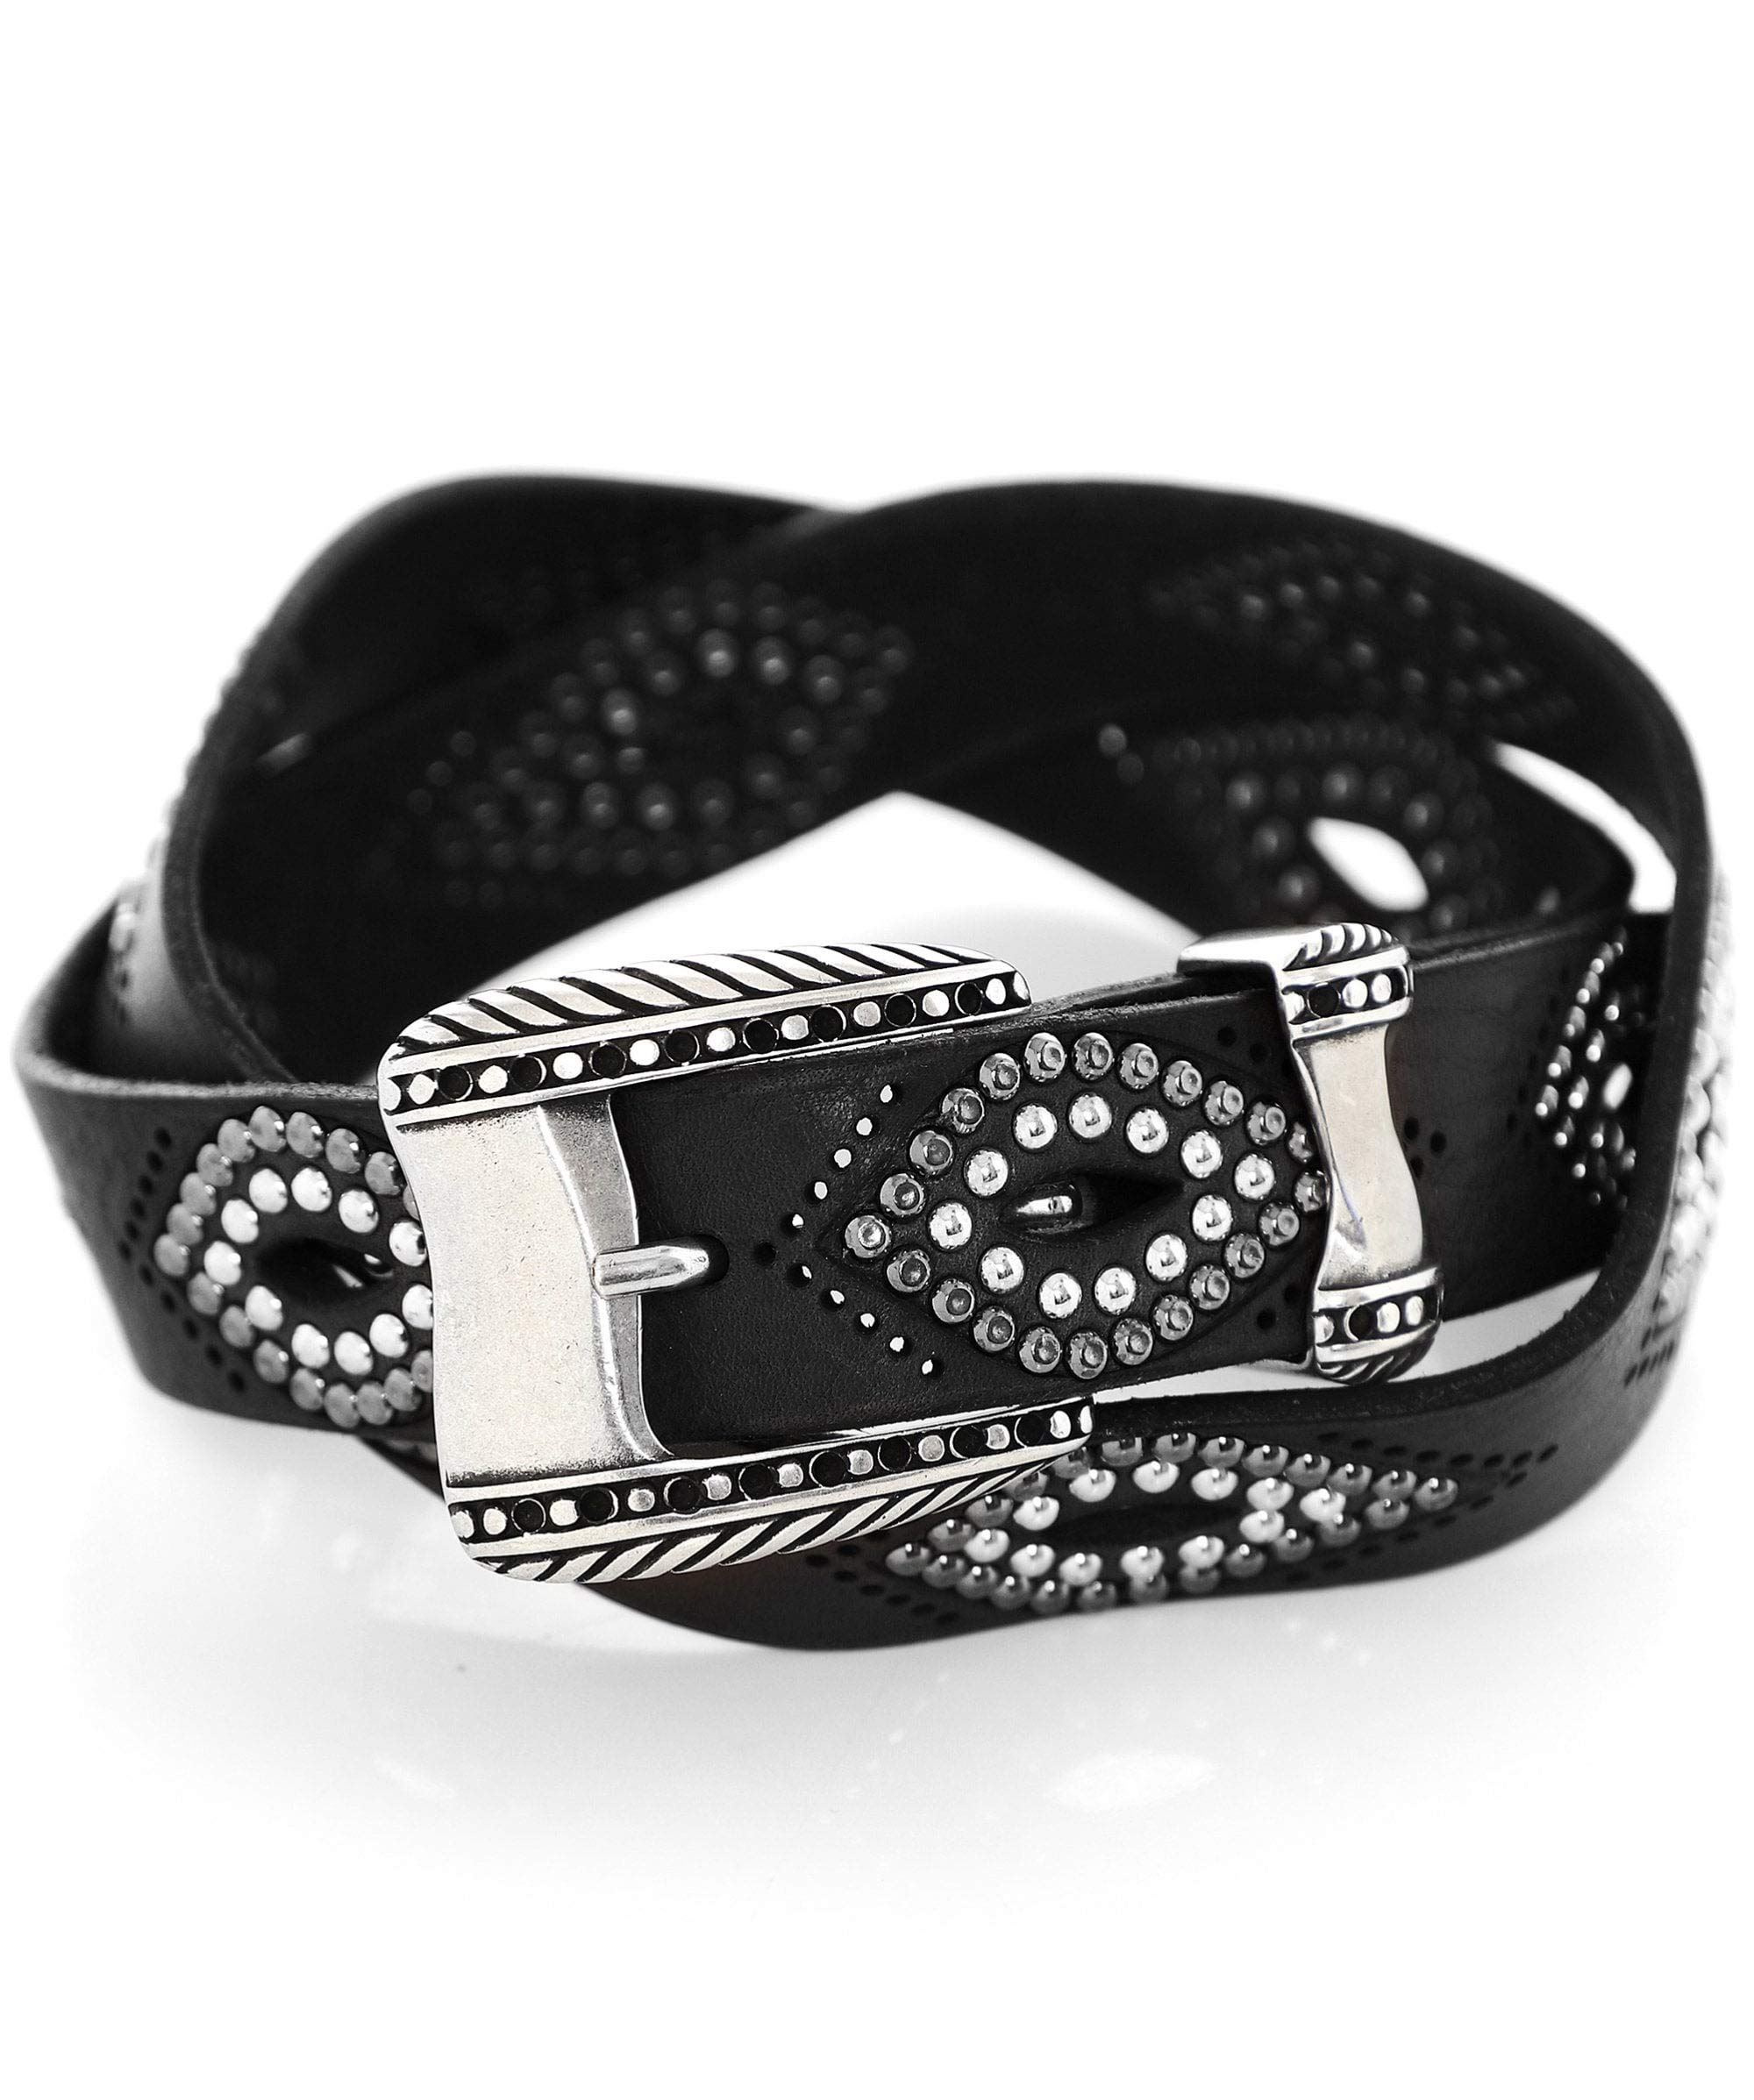 Nanni Women's Studded Leather Cut Out Belt Black 34